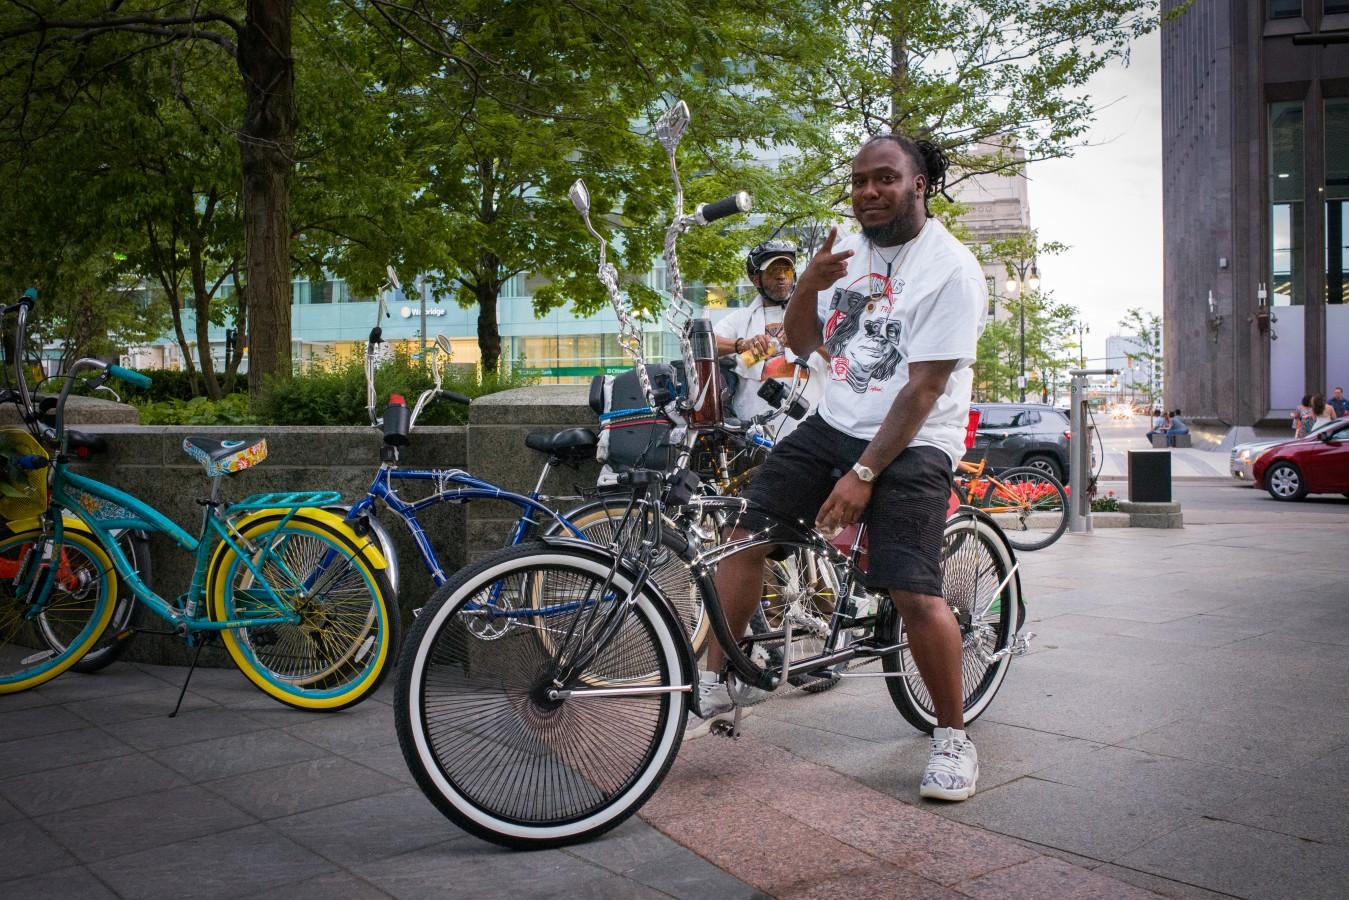 Easyrider, downtown Detroit